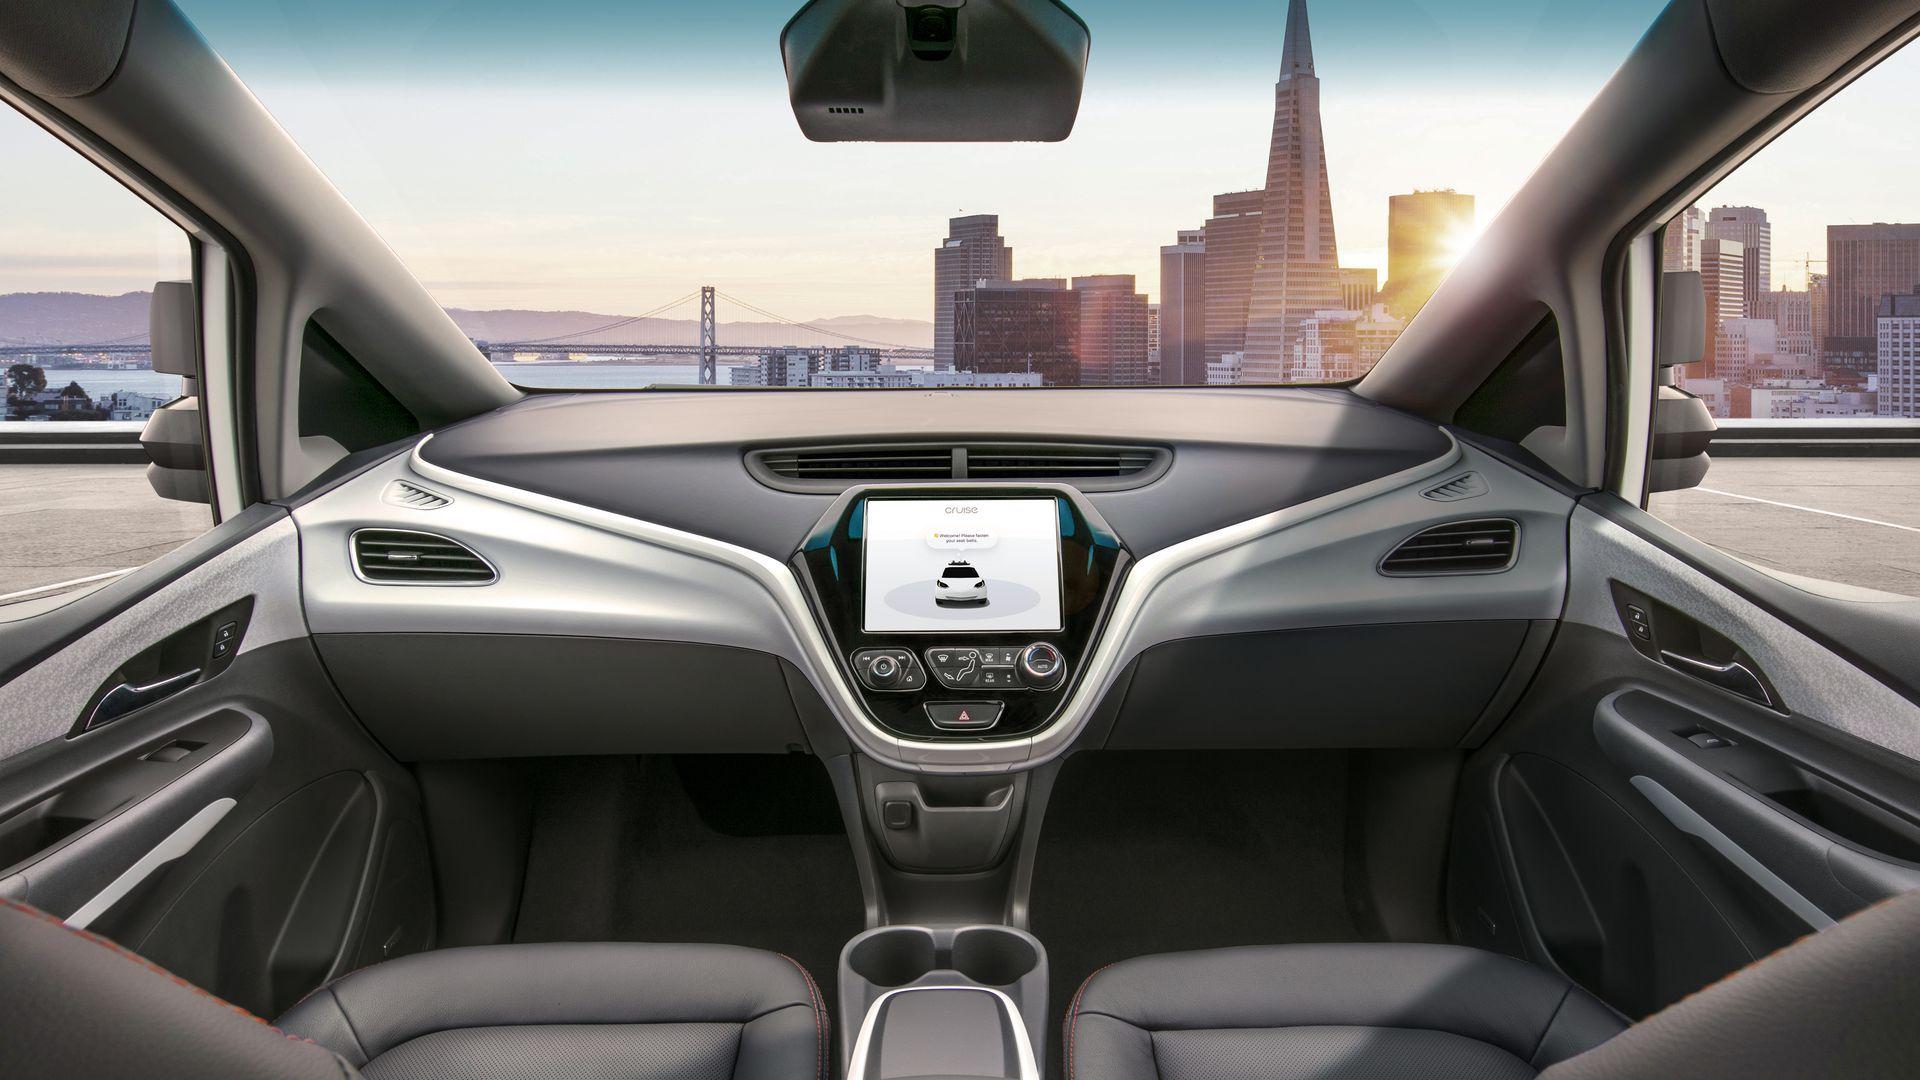 GM's driverless EV concept